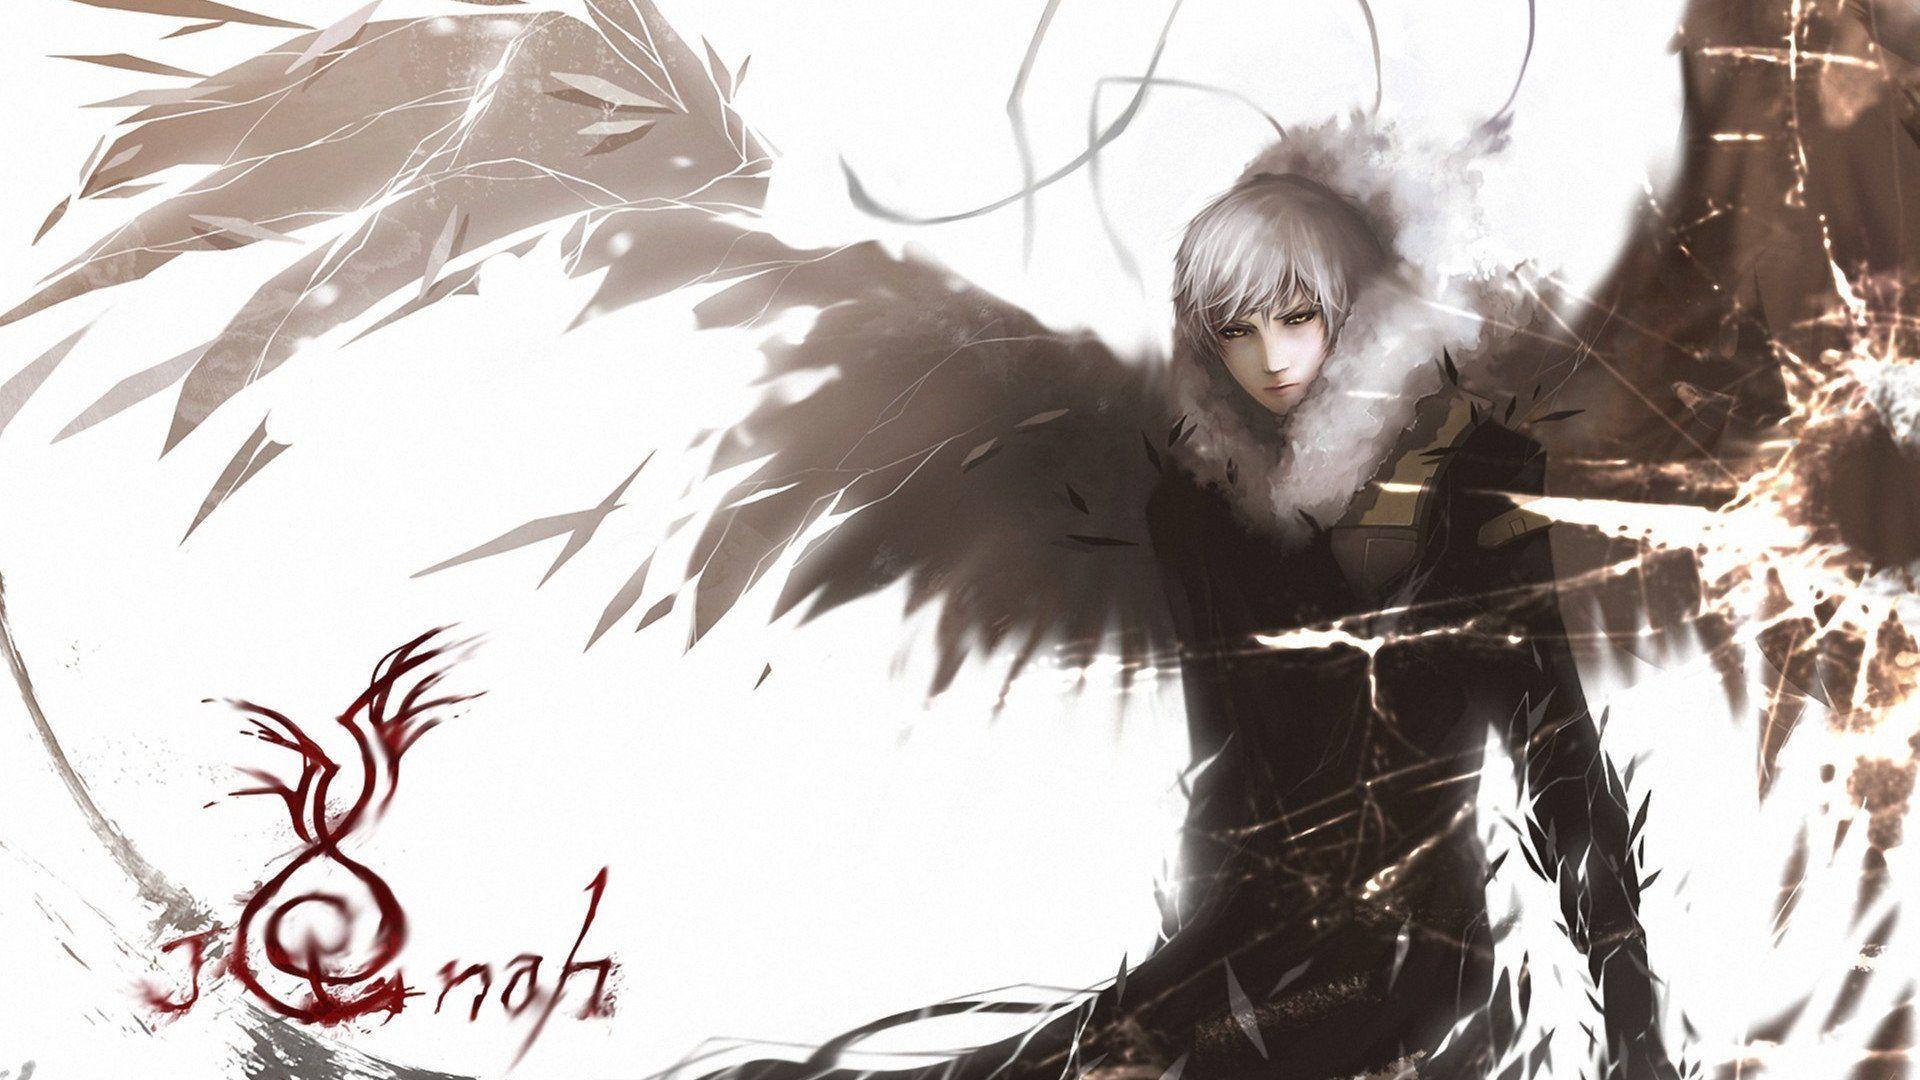 Anime Original Anime Angel Hoodie White Hair Bleached Eyes